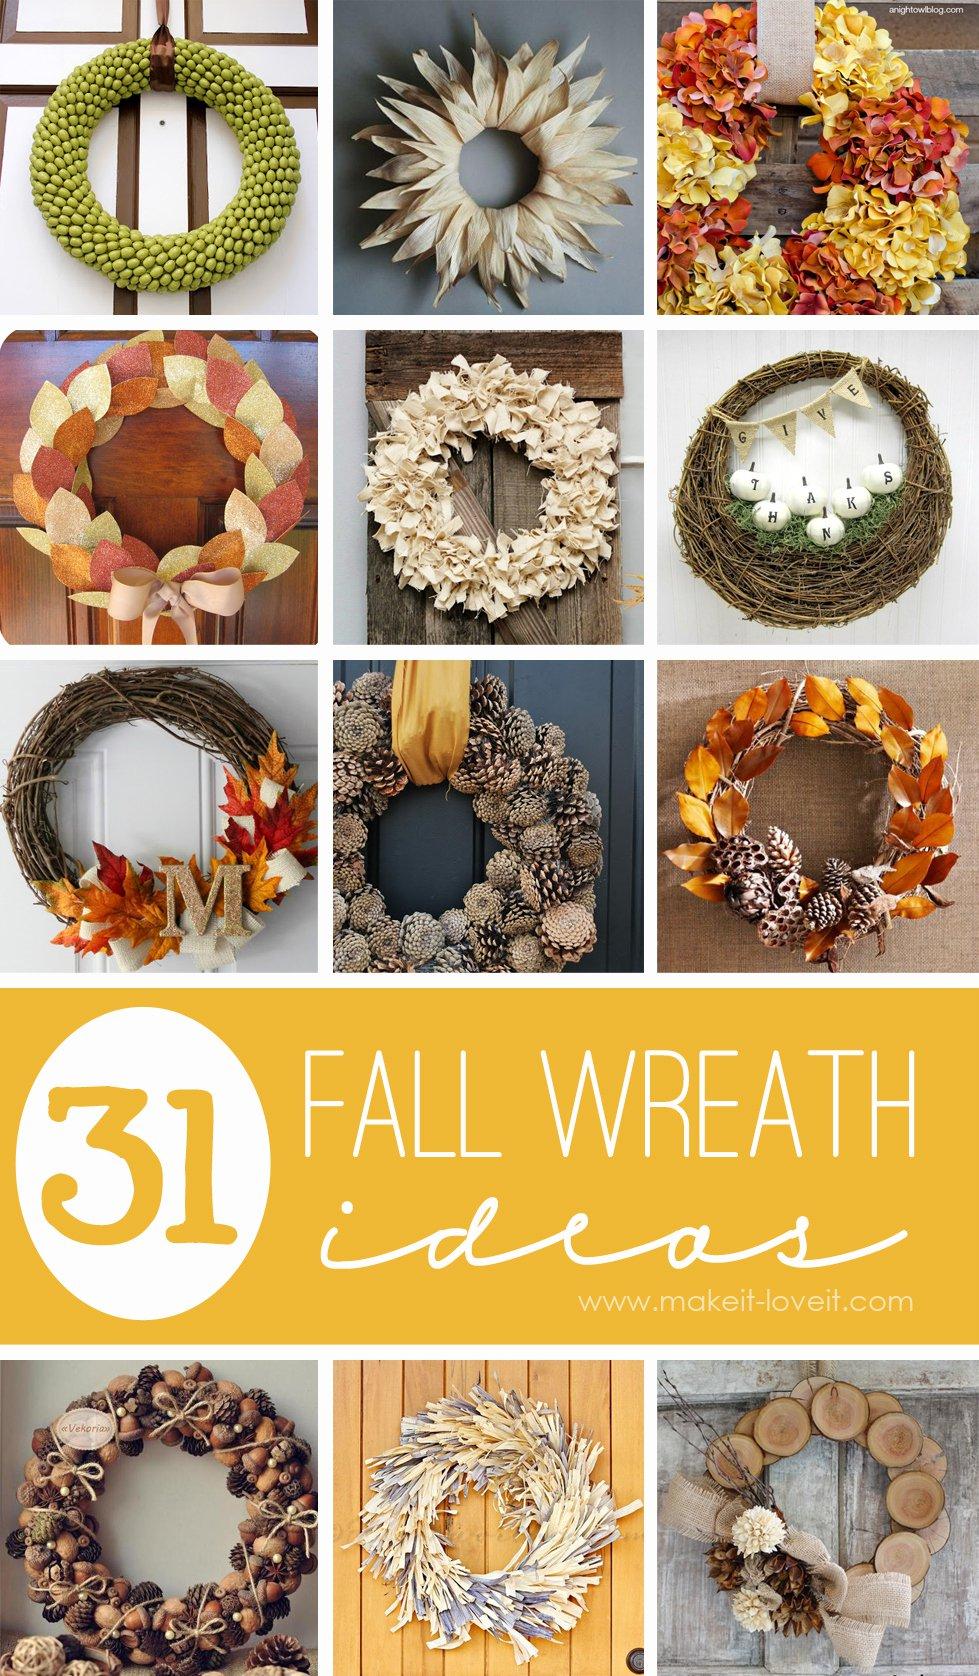 31-fall-wreath-ideas